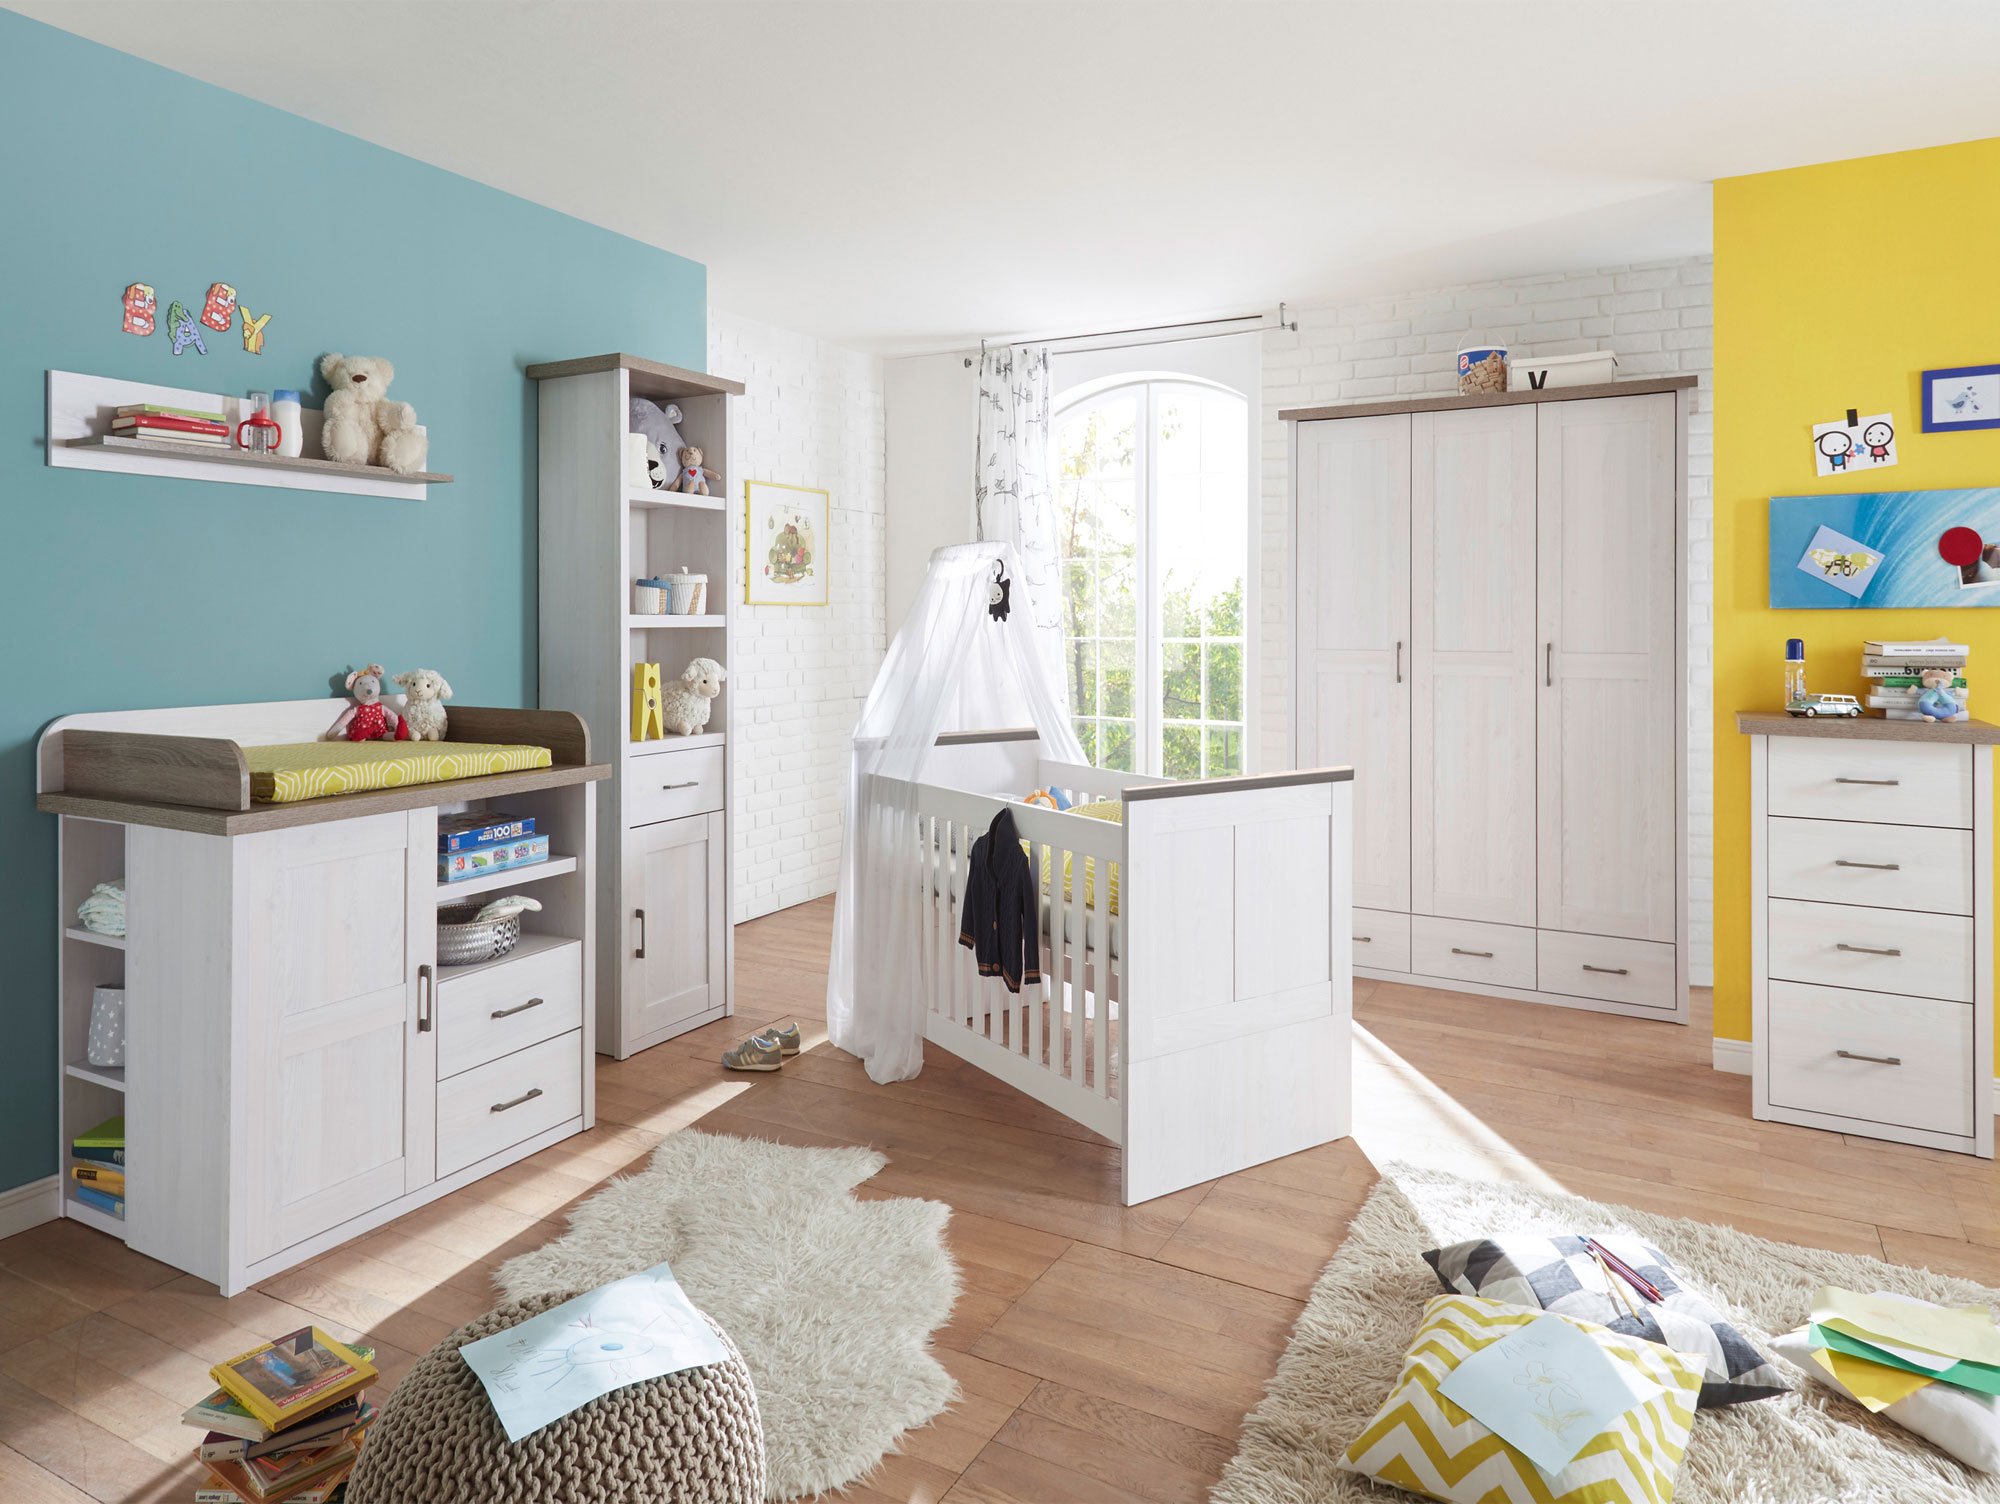 lucy wandregal pinie wei tr ffel. Black Bedroom Furniture Sets. Home Design Ideas